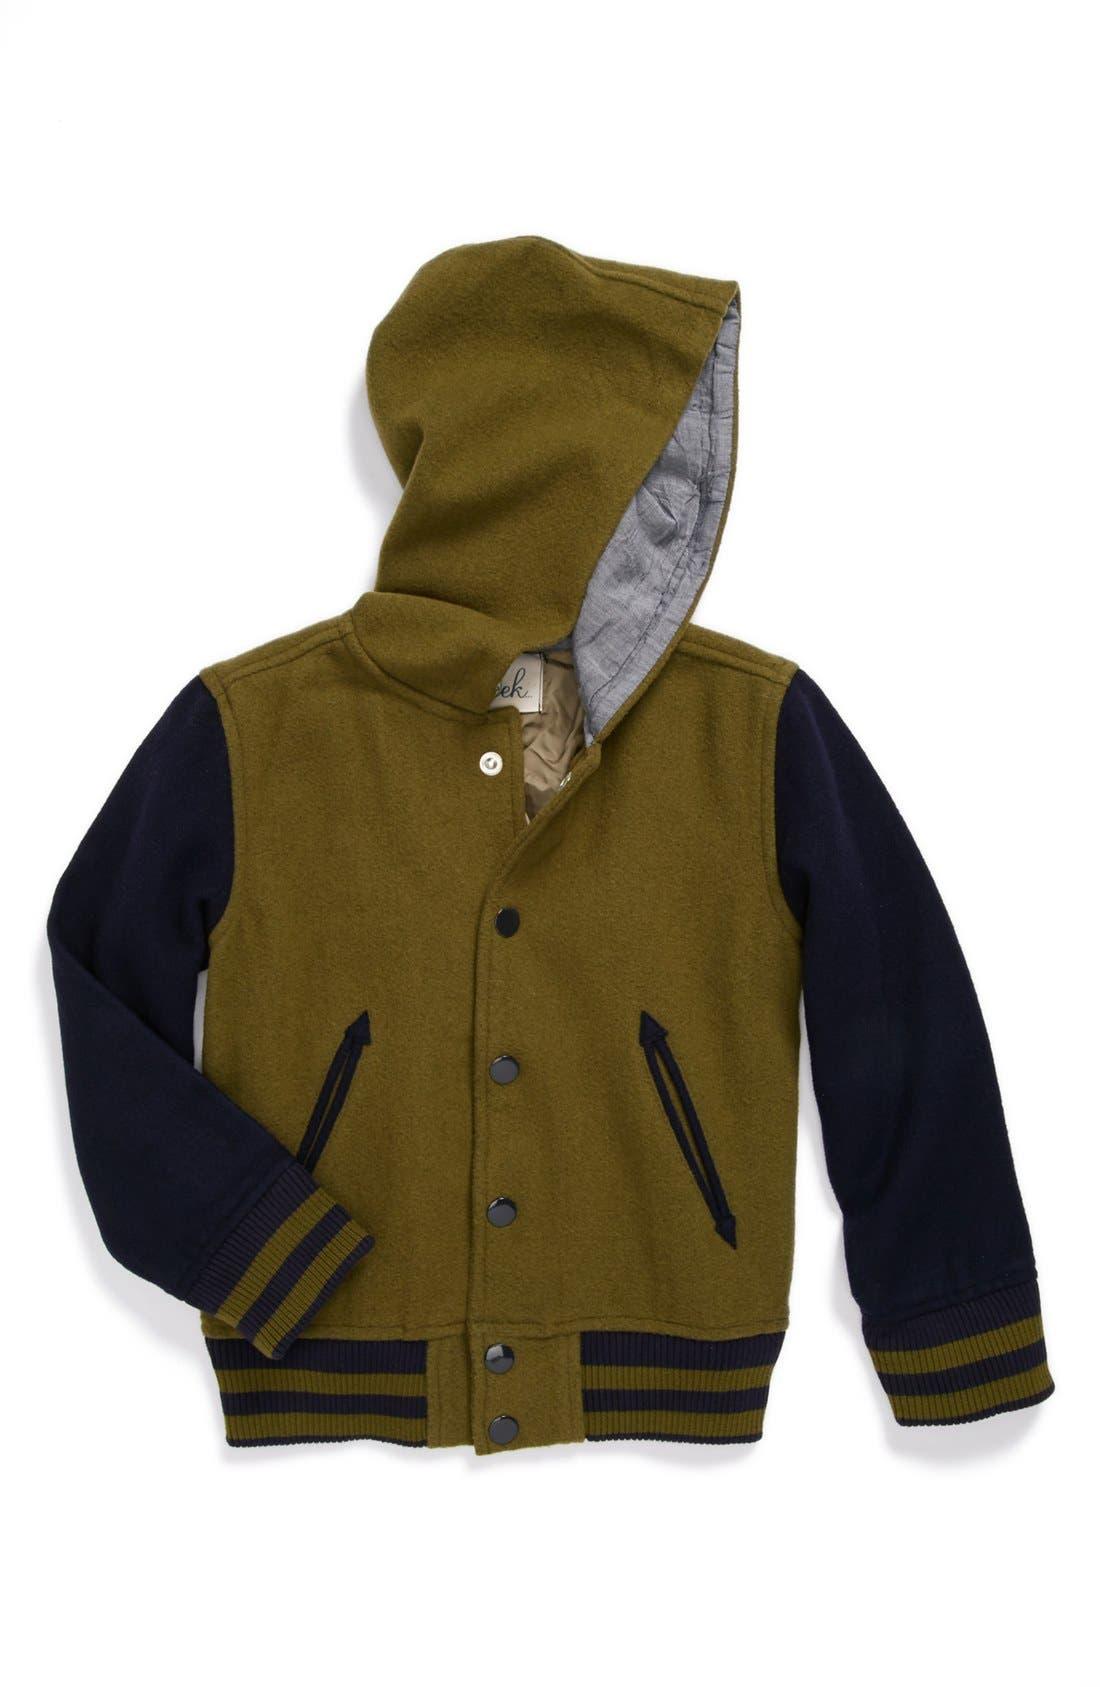 Alternate Image 1 Selected - Peek Hooded Varsity Jacket (Toddler Boys, Little Boys & Big Boys)